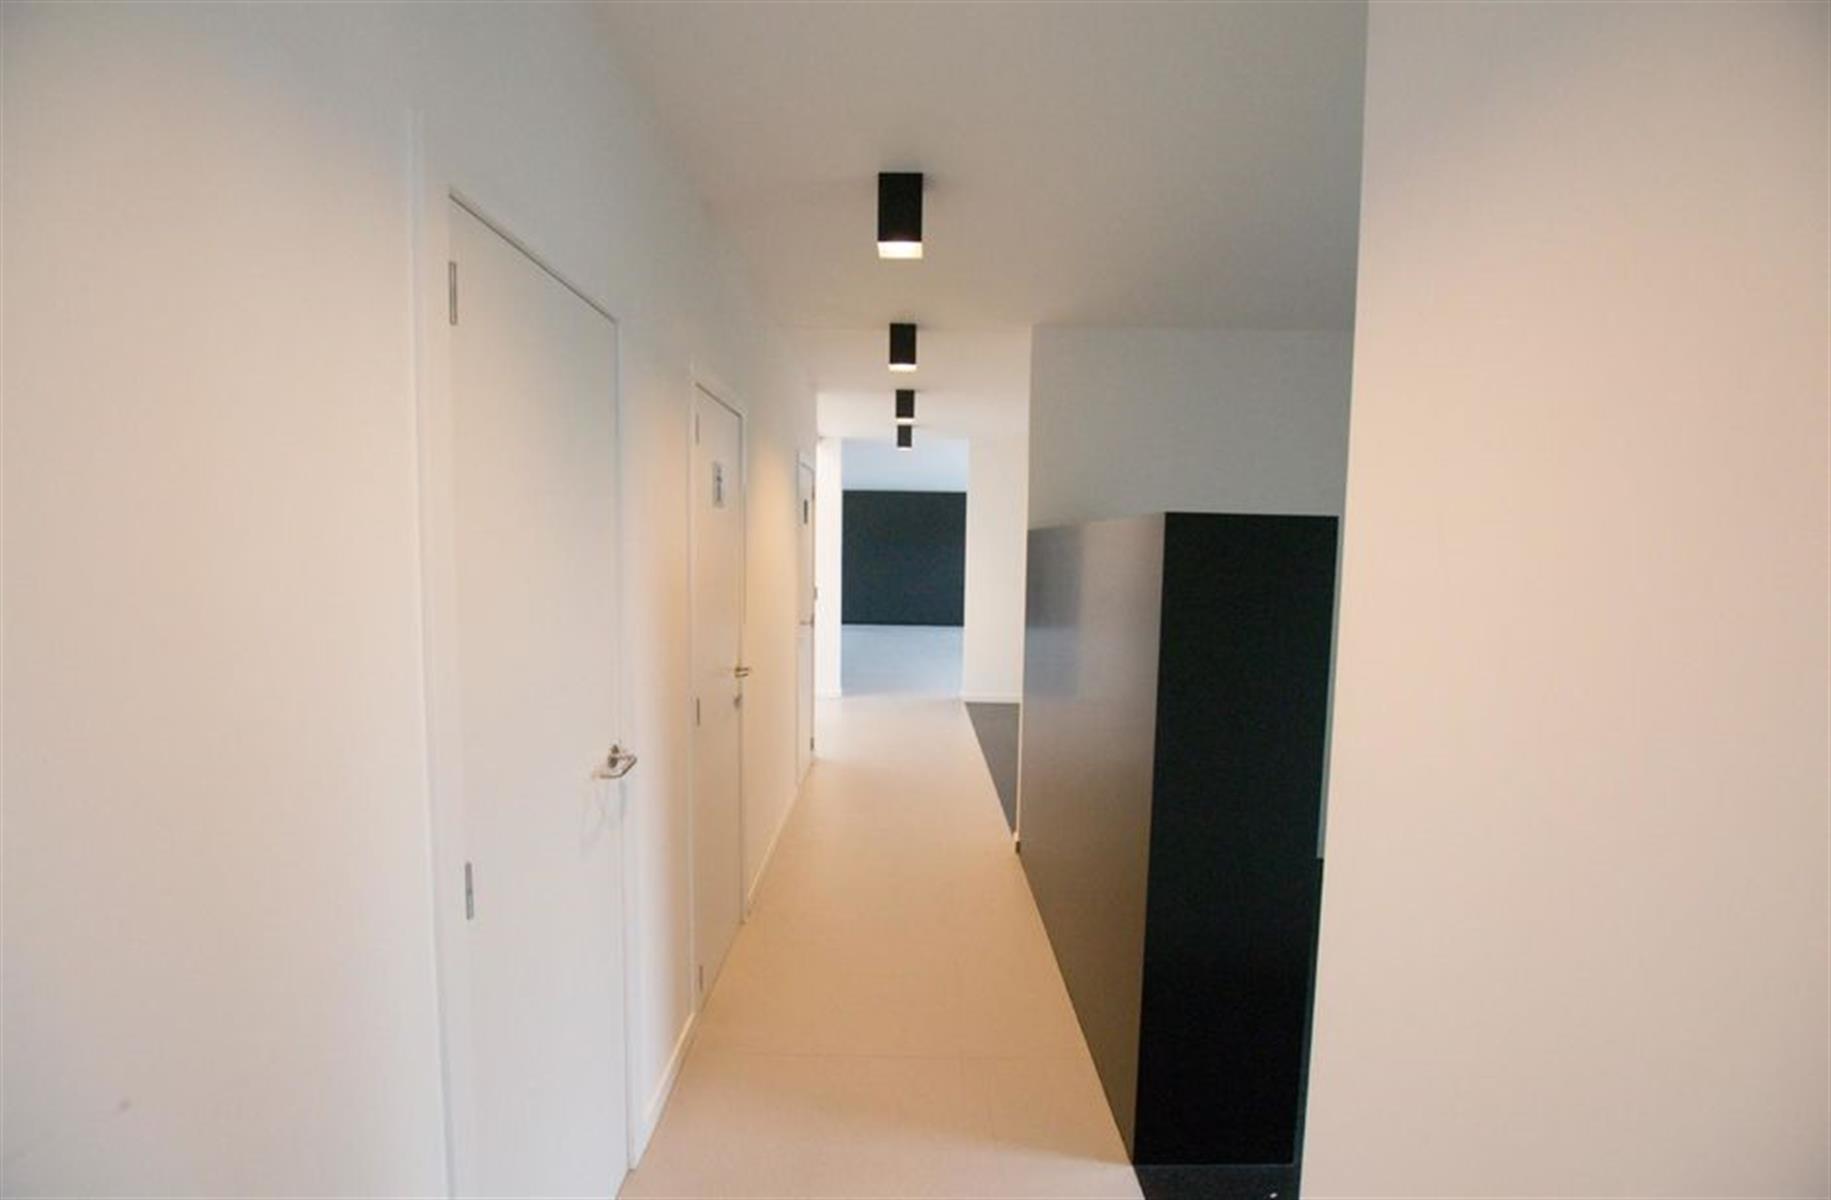 kantoor te huur K003 - Middelmolenlaan 96, 2100 Antwerpen Deurne, België 5